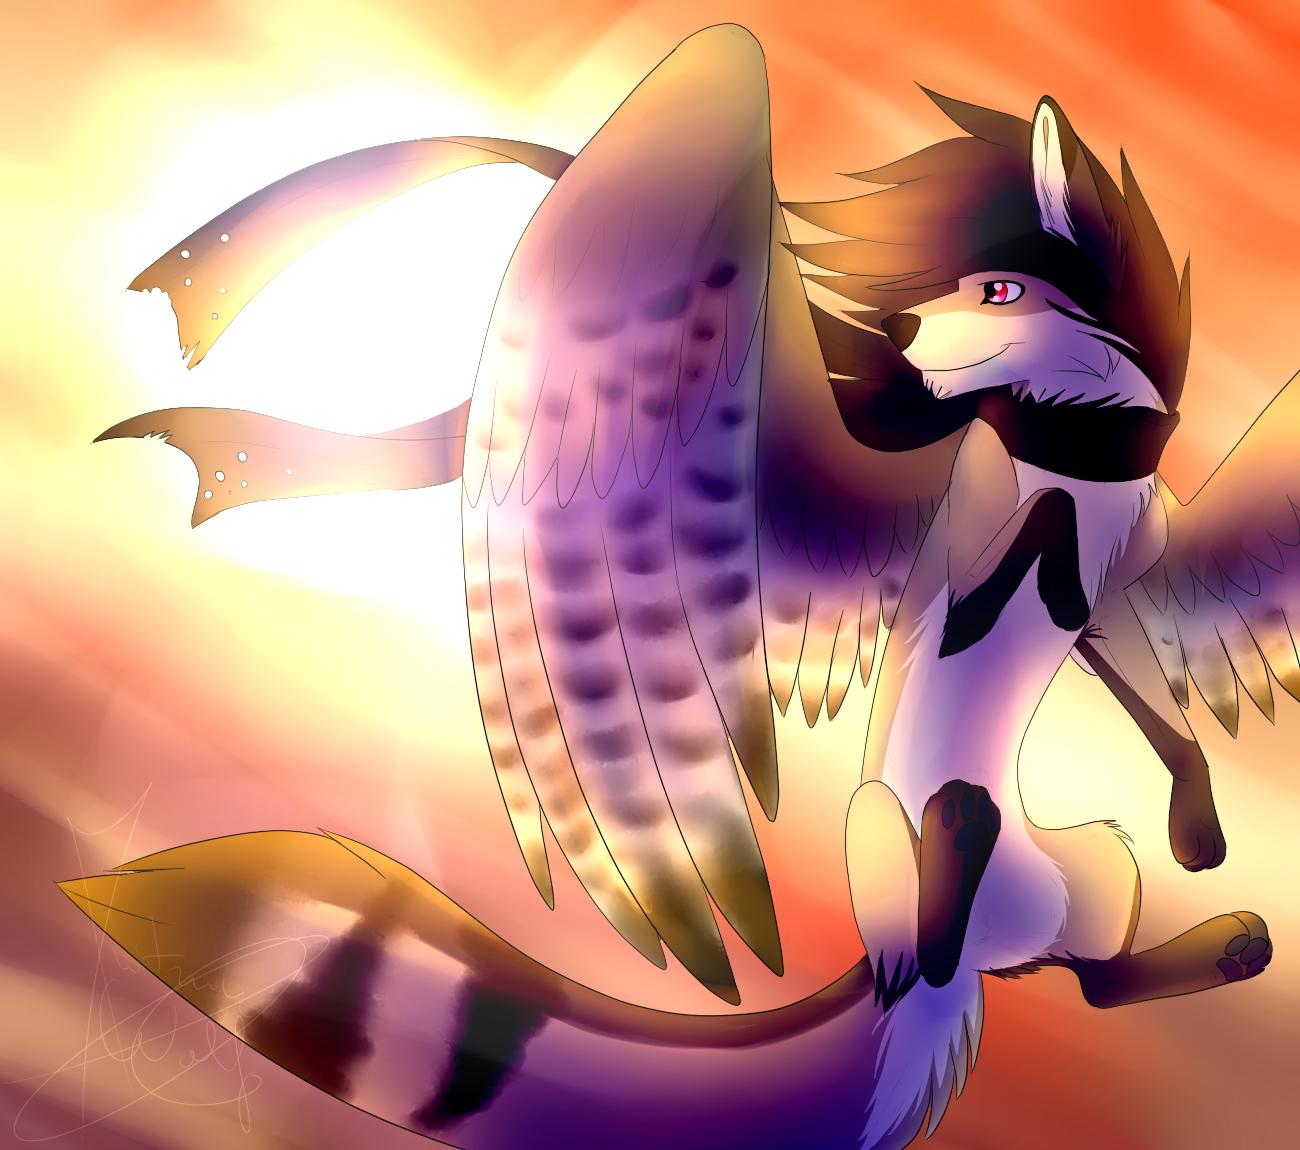 Artista de Devian-Art: Mitsuki-Wolf. *w* - Página 3 Sun_and_wings_by_mitsuki_wolf-d7bc9rj